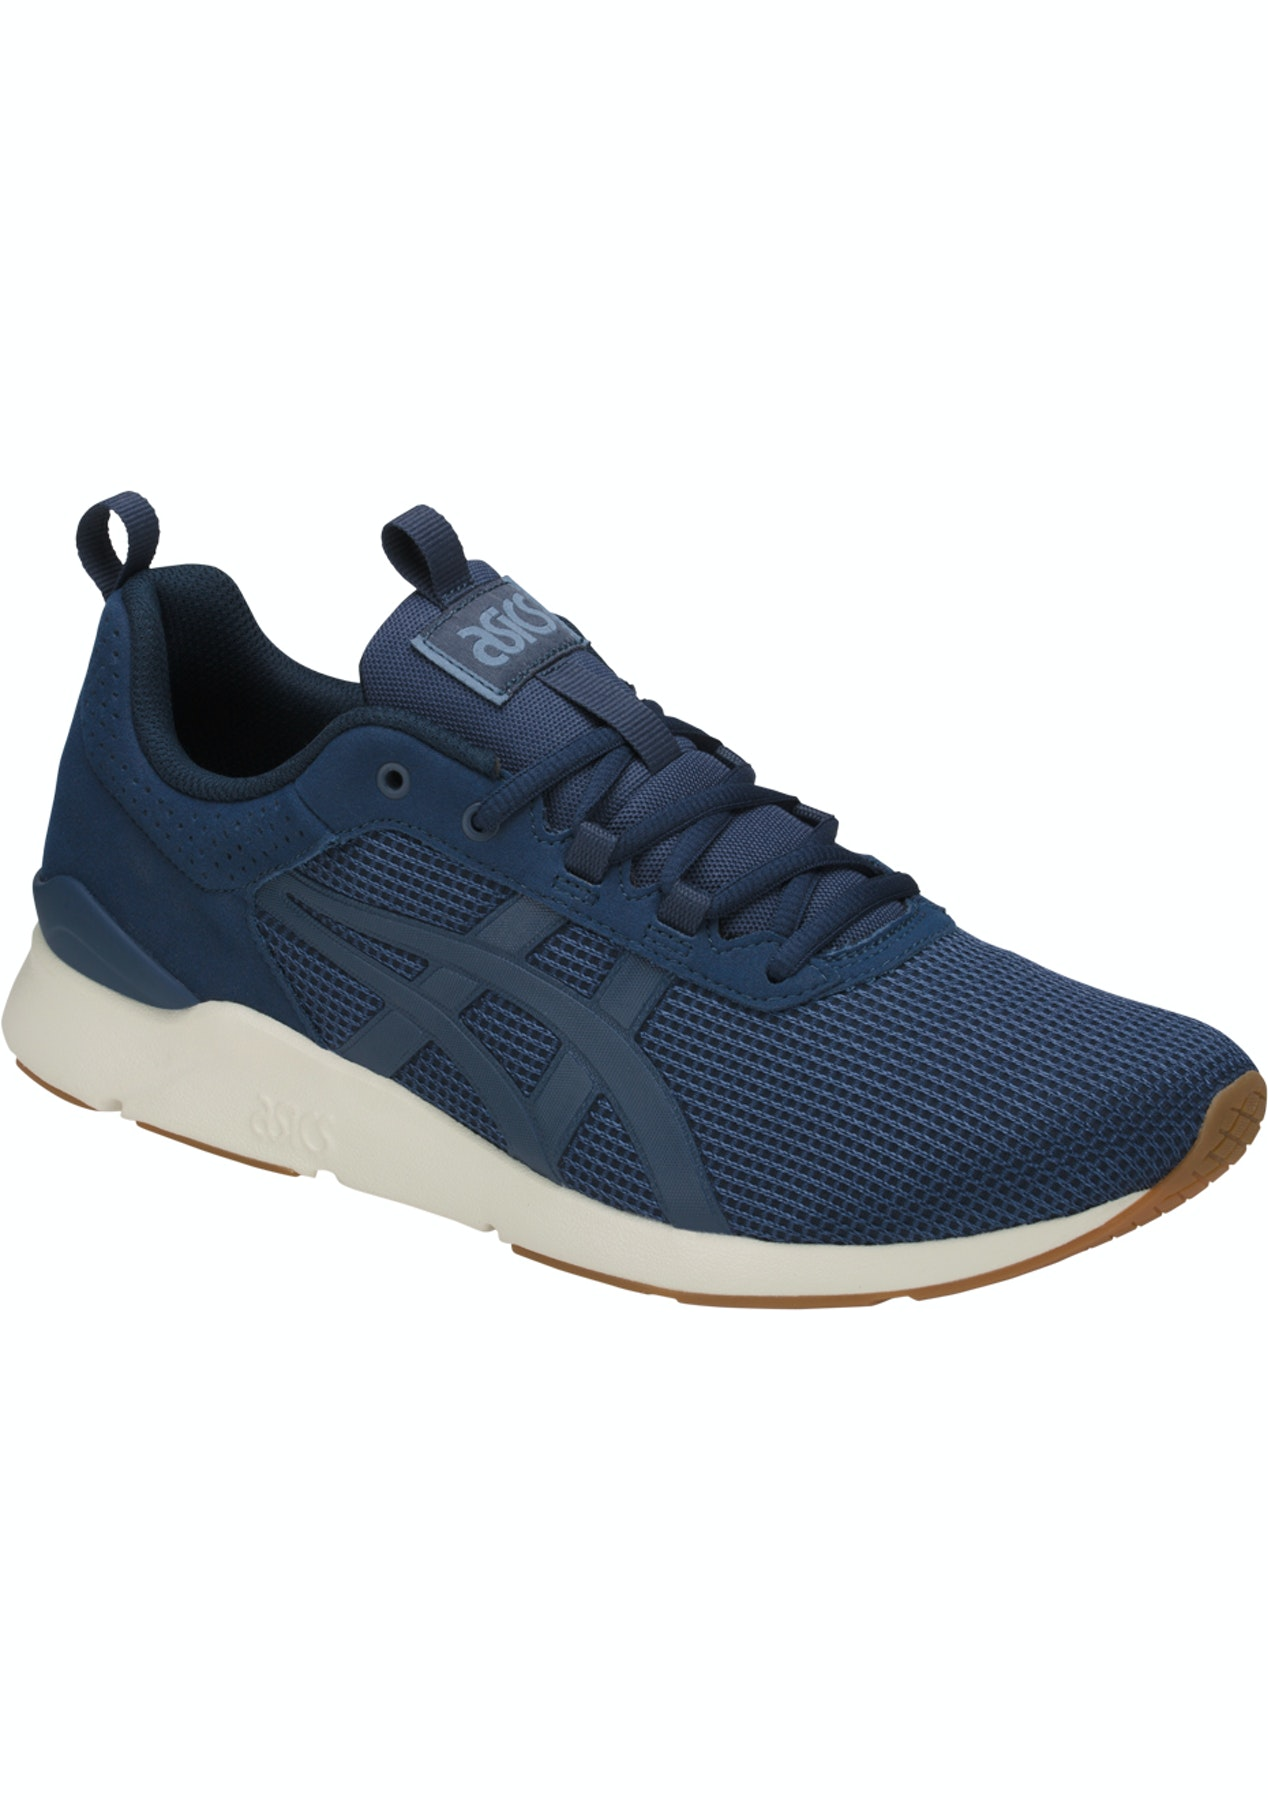 391a8b68091a Asics Tiger - Gel-Lyte Runner - Unisex - Dark Blue Dark Blue - PE Nation X  Reebok   More - Onceit